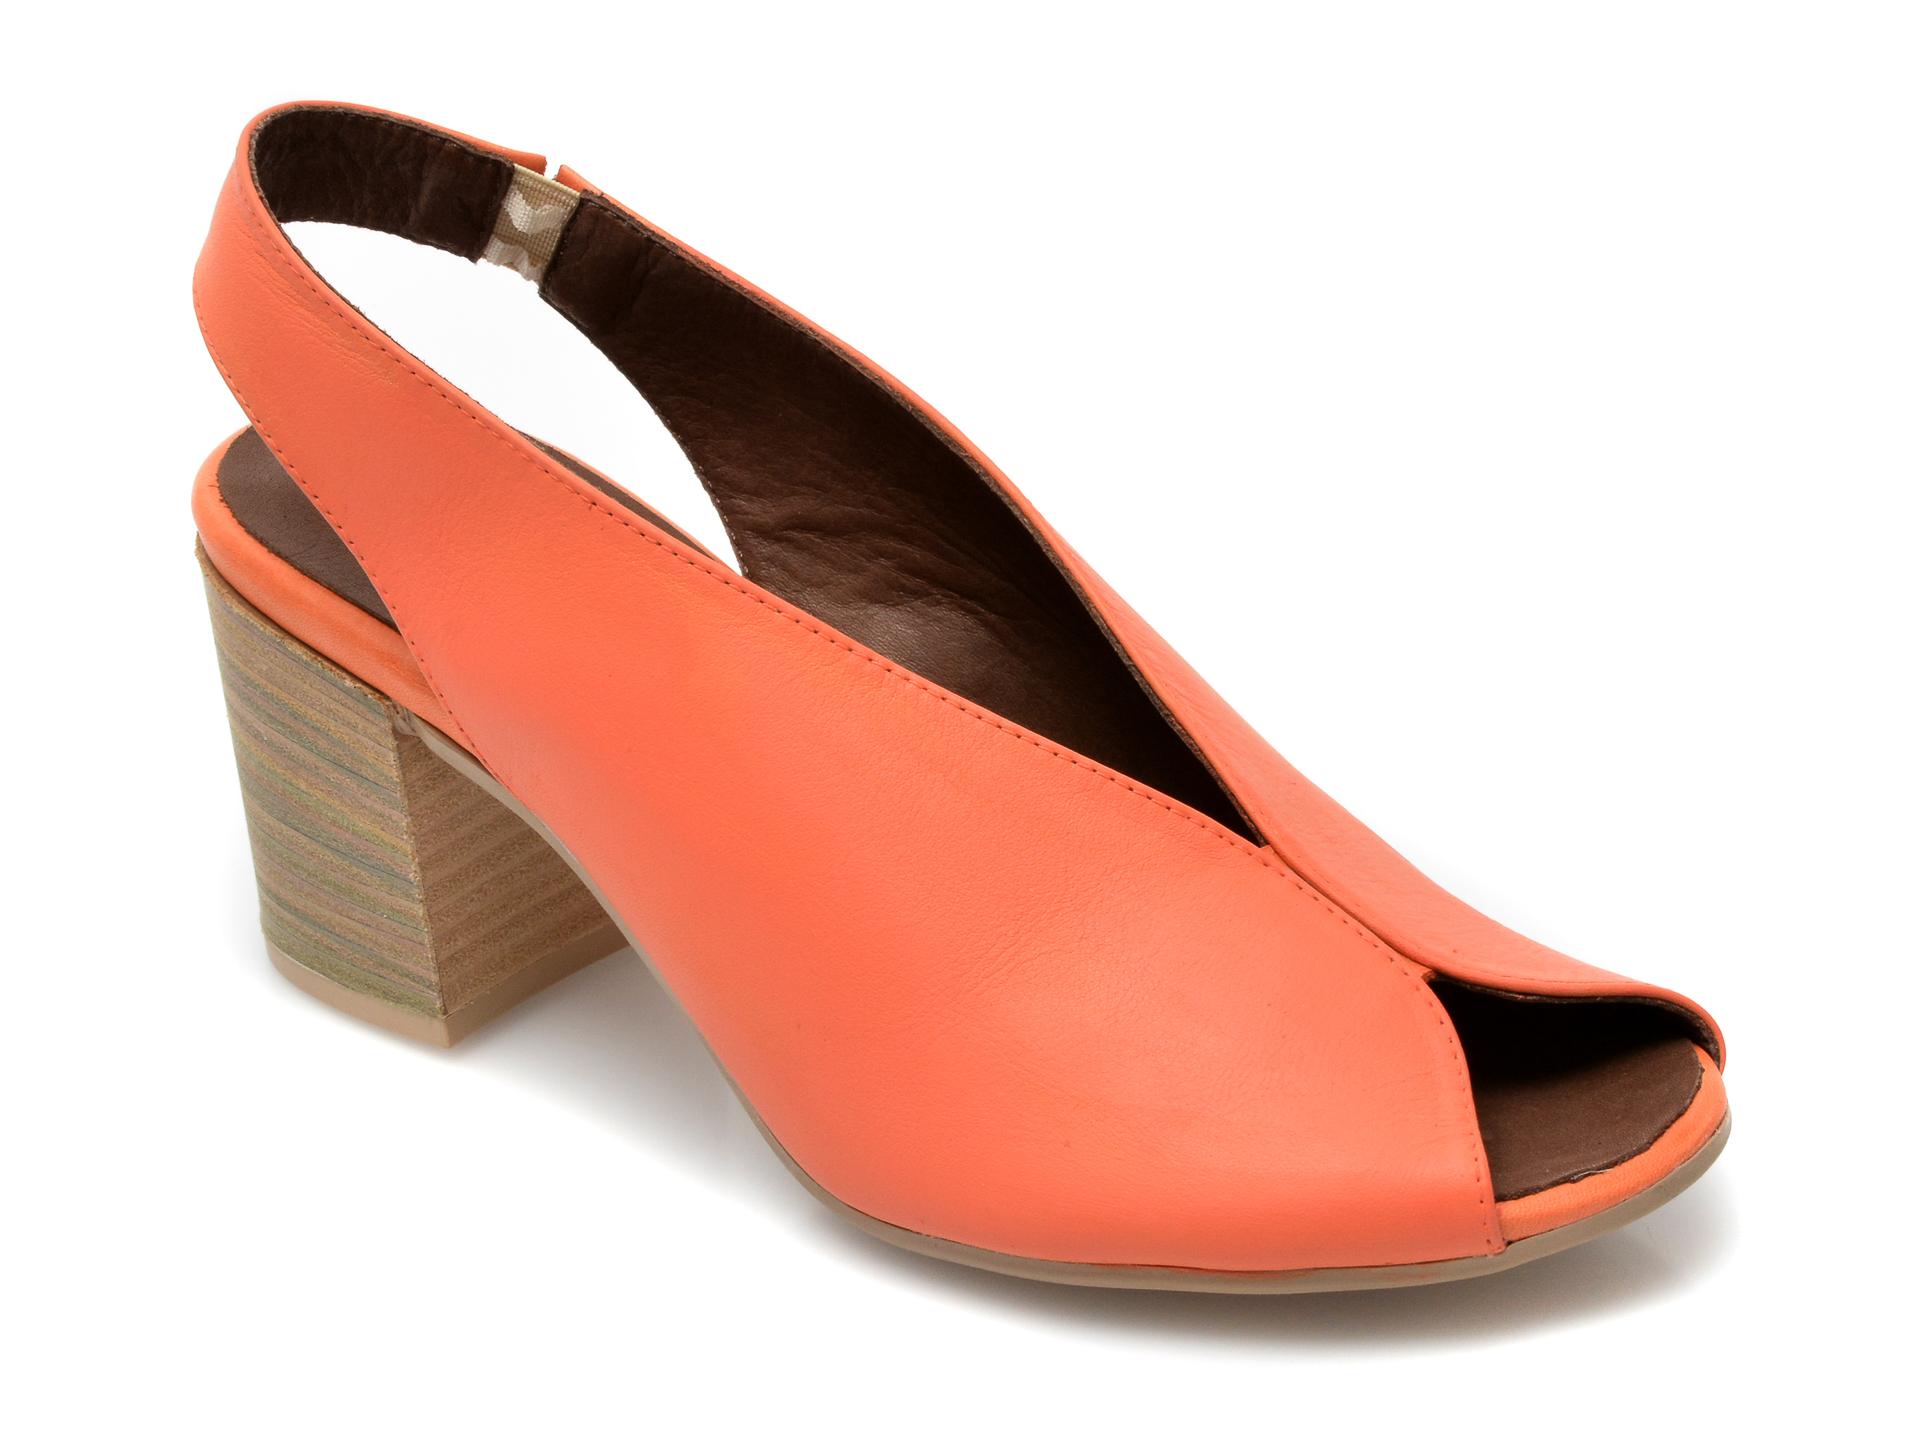 Sandale BABOOS portocalii, 1806, din piele naturala imagine otter.ro 2021